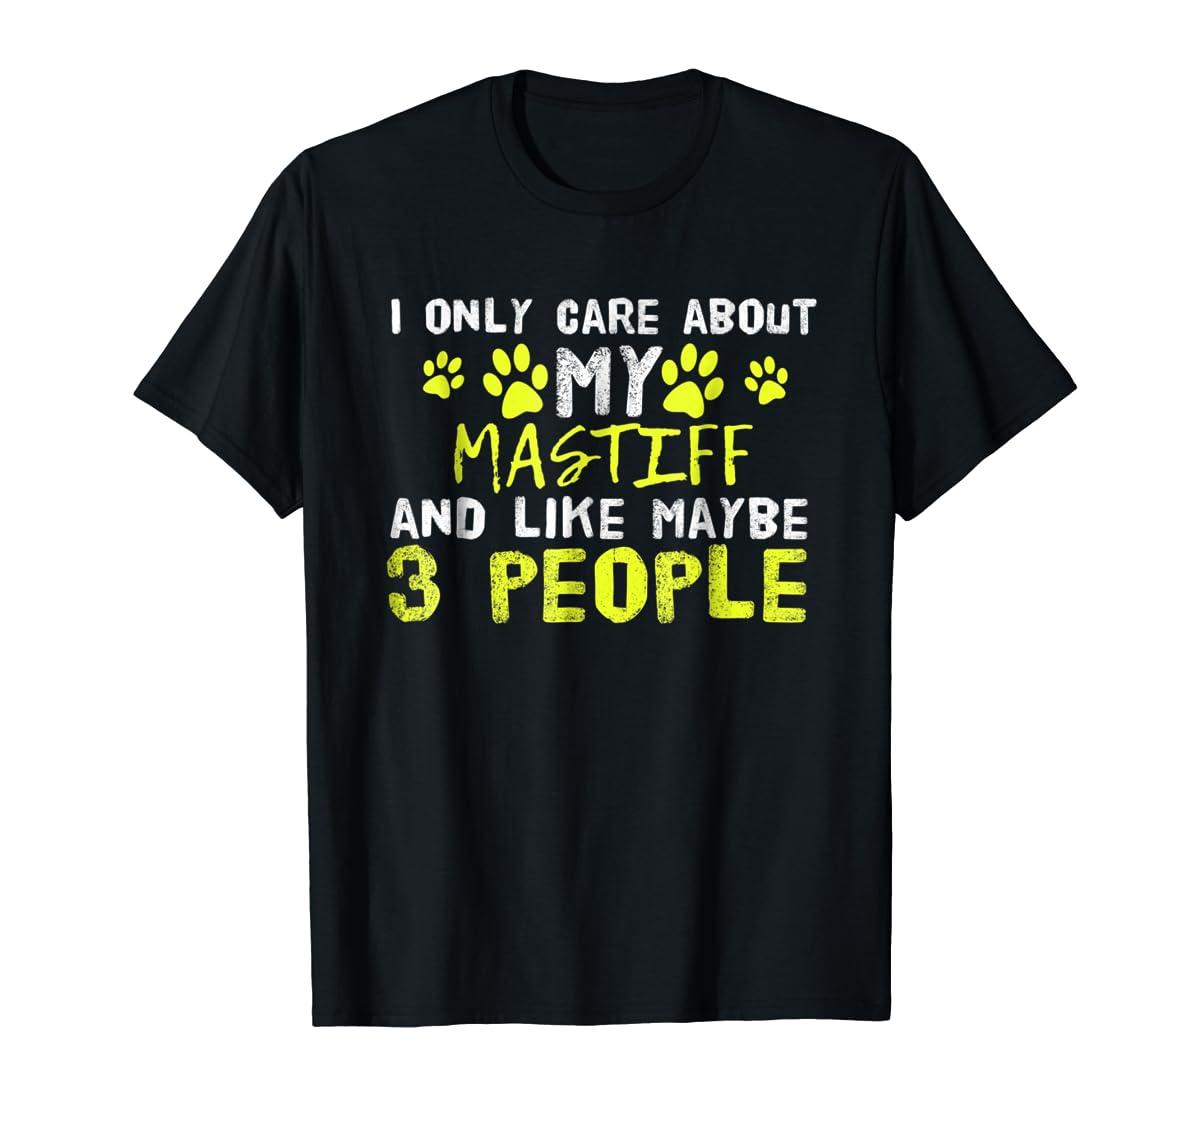 Mastiff Dog Shirt Introvert Love My Dog Tee-Men's T-Shirt-Black